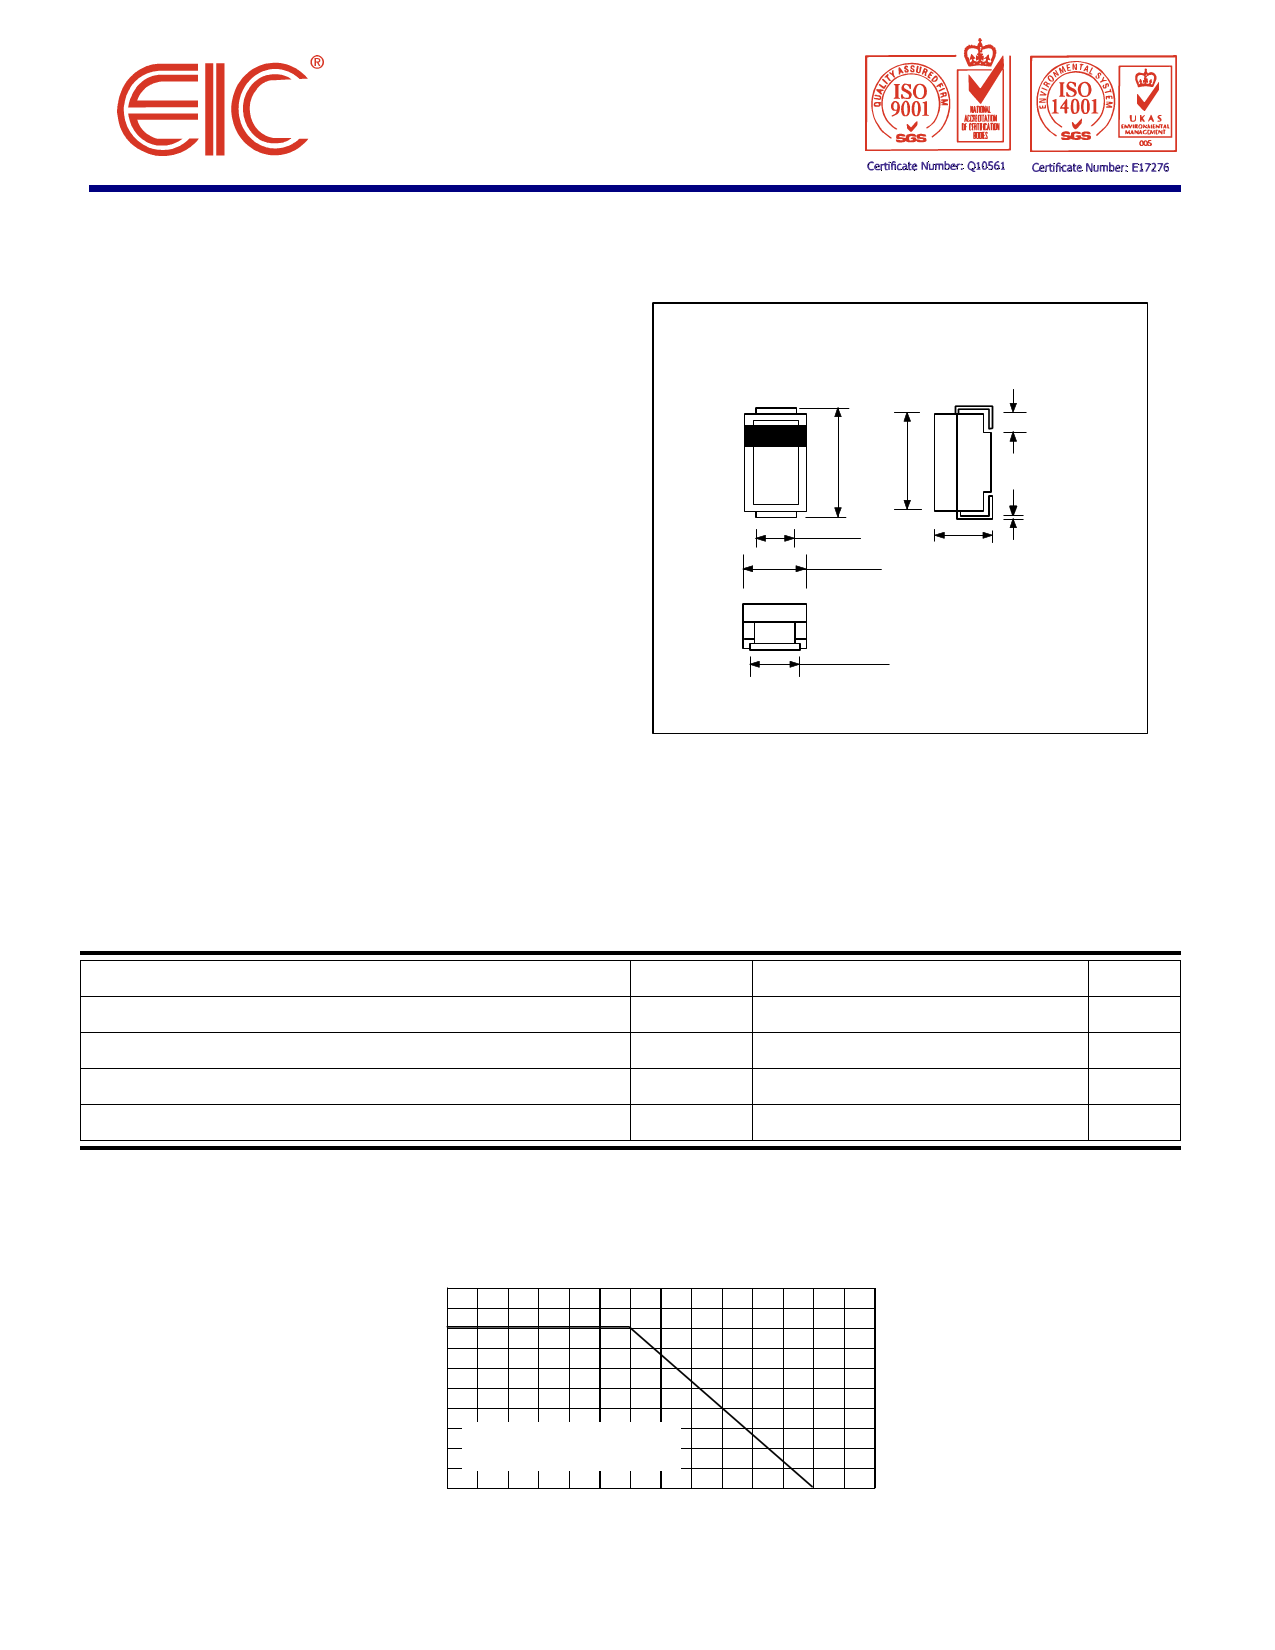 SZ40B6 datasheet, circuit